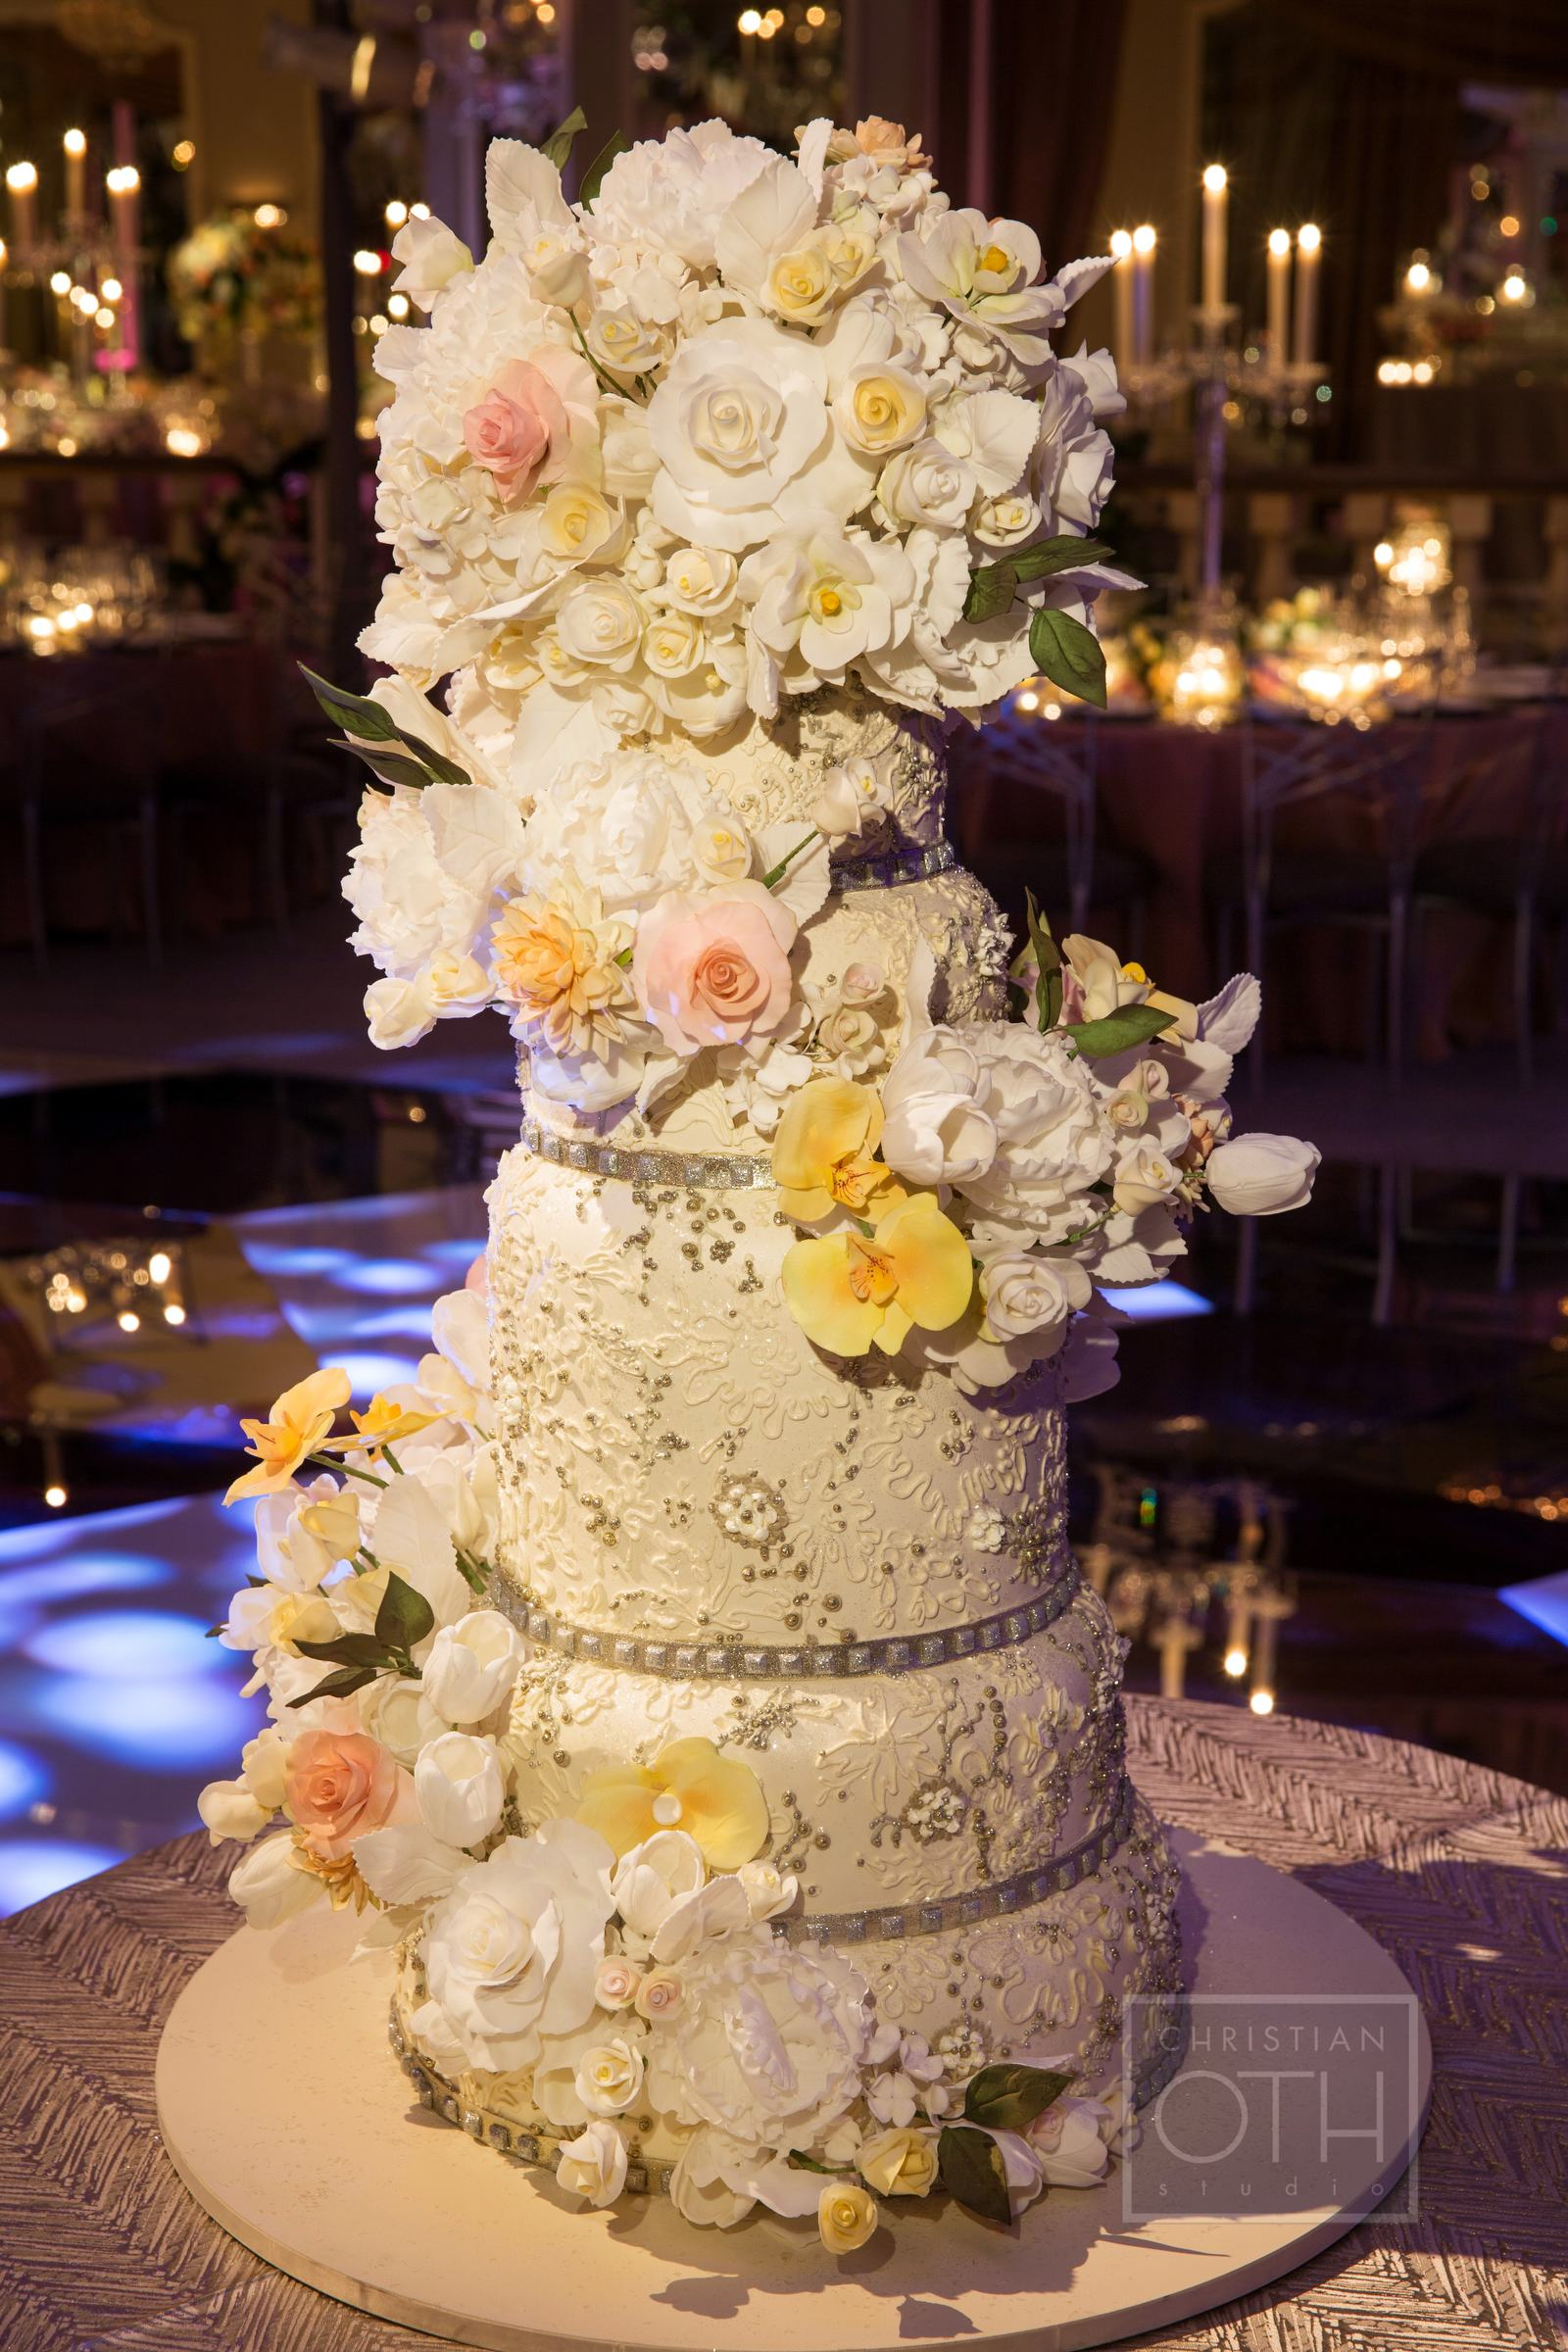 Ceci_New_York_Custom_Invitation_Pierre__City_ Destination_Wedding_Luxury_Personalized_Ceci_Style_Bride_Rose_Gold_Foil_Stamping175.JPG